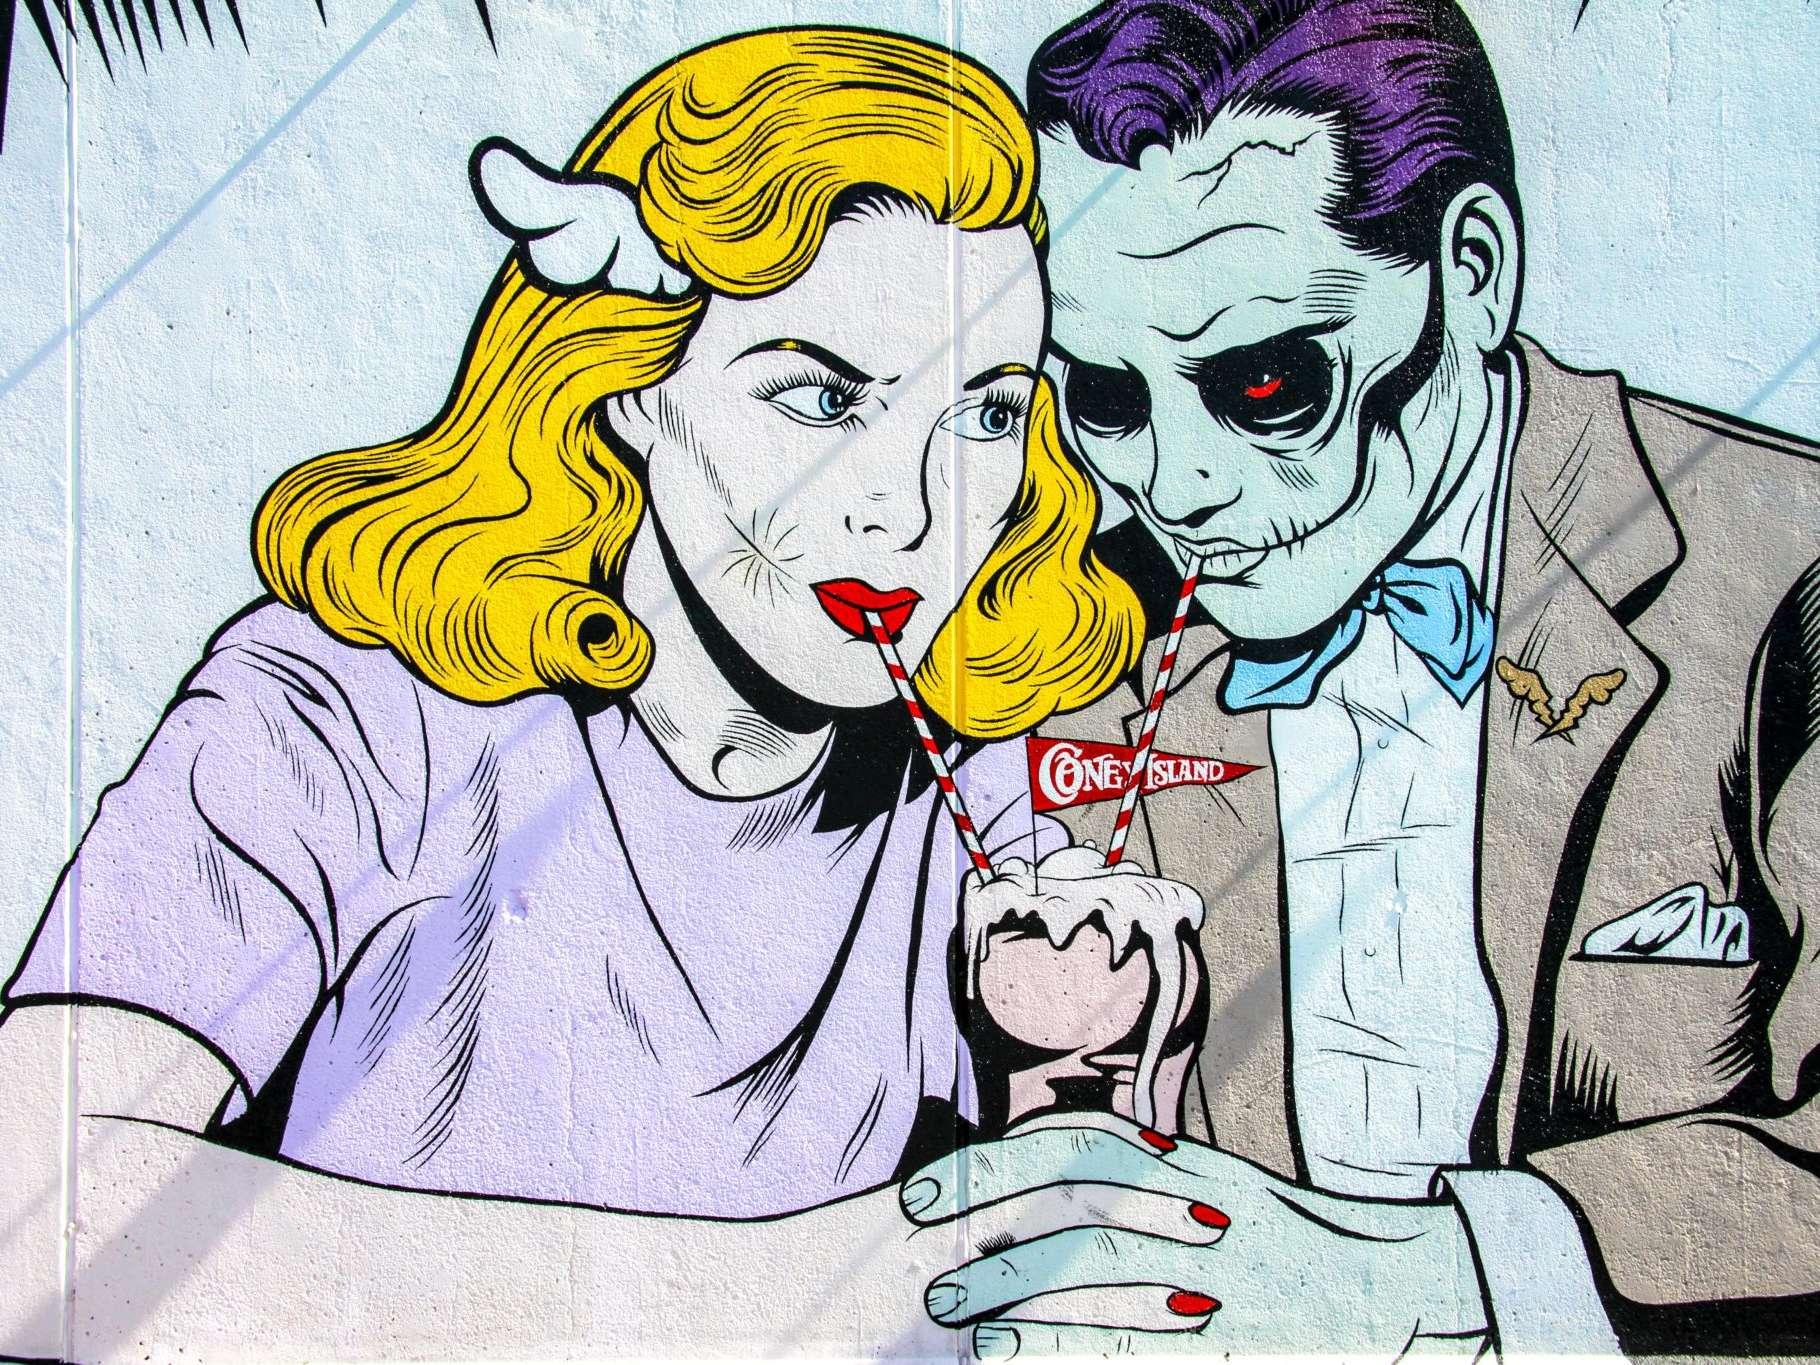 A comic book style man and woman sharing a milkshake